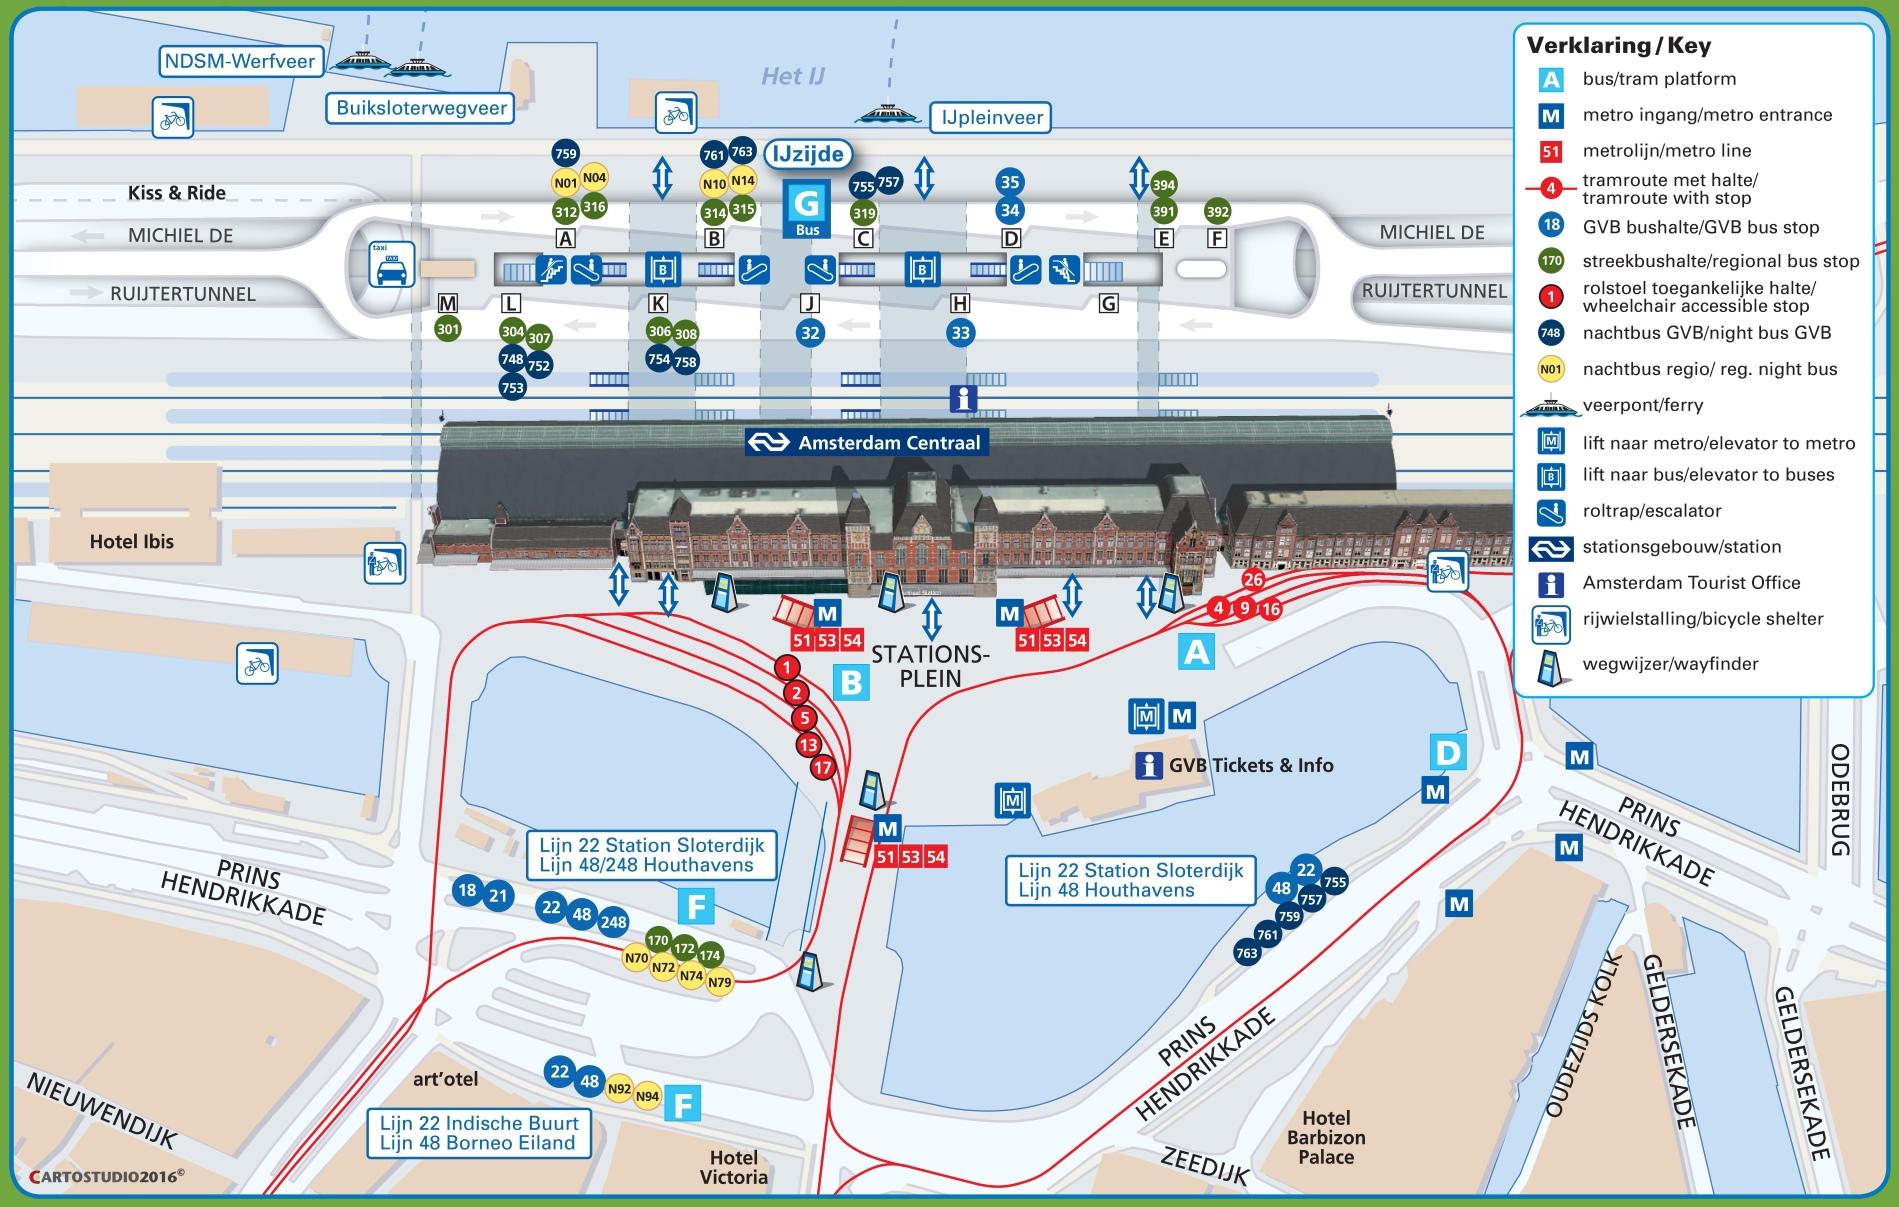 Sydney Central Station Map Amsterdam central station map Sydney Central Station Map